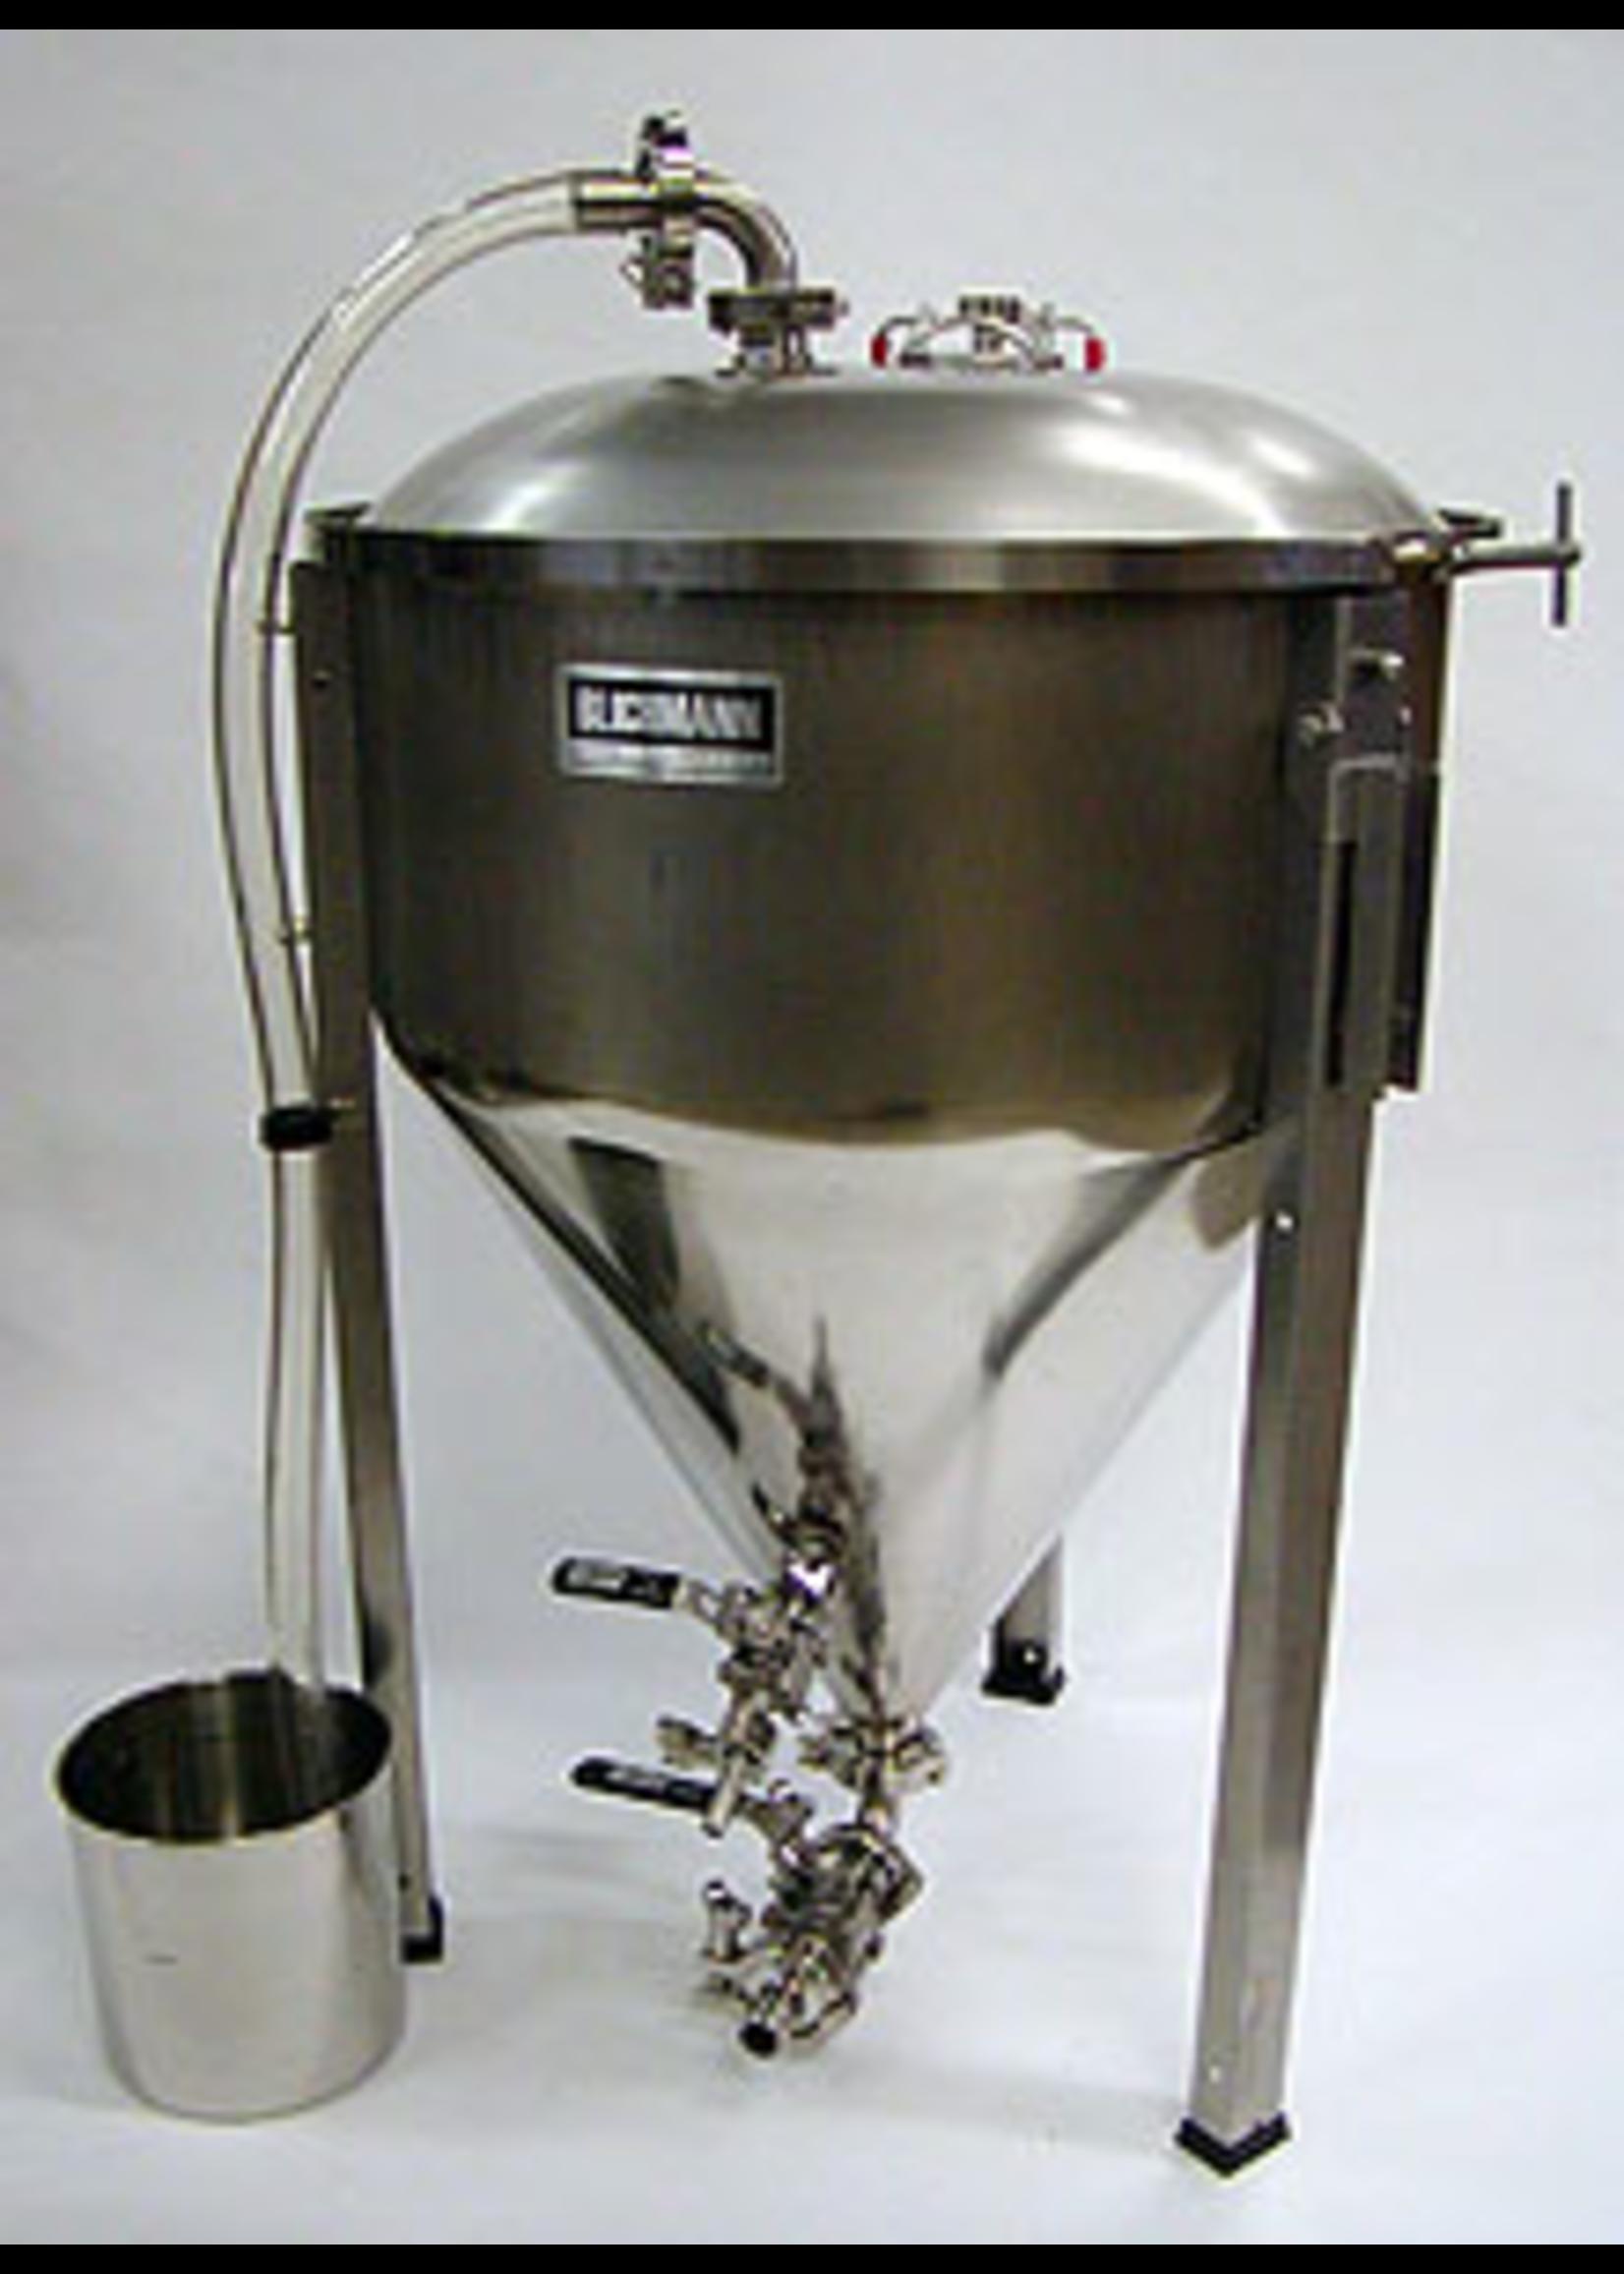 Blichmann Blichmann Fermenator - Conical Fermentor - 27 Gallon with Tri-clamp Fittings